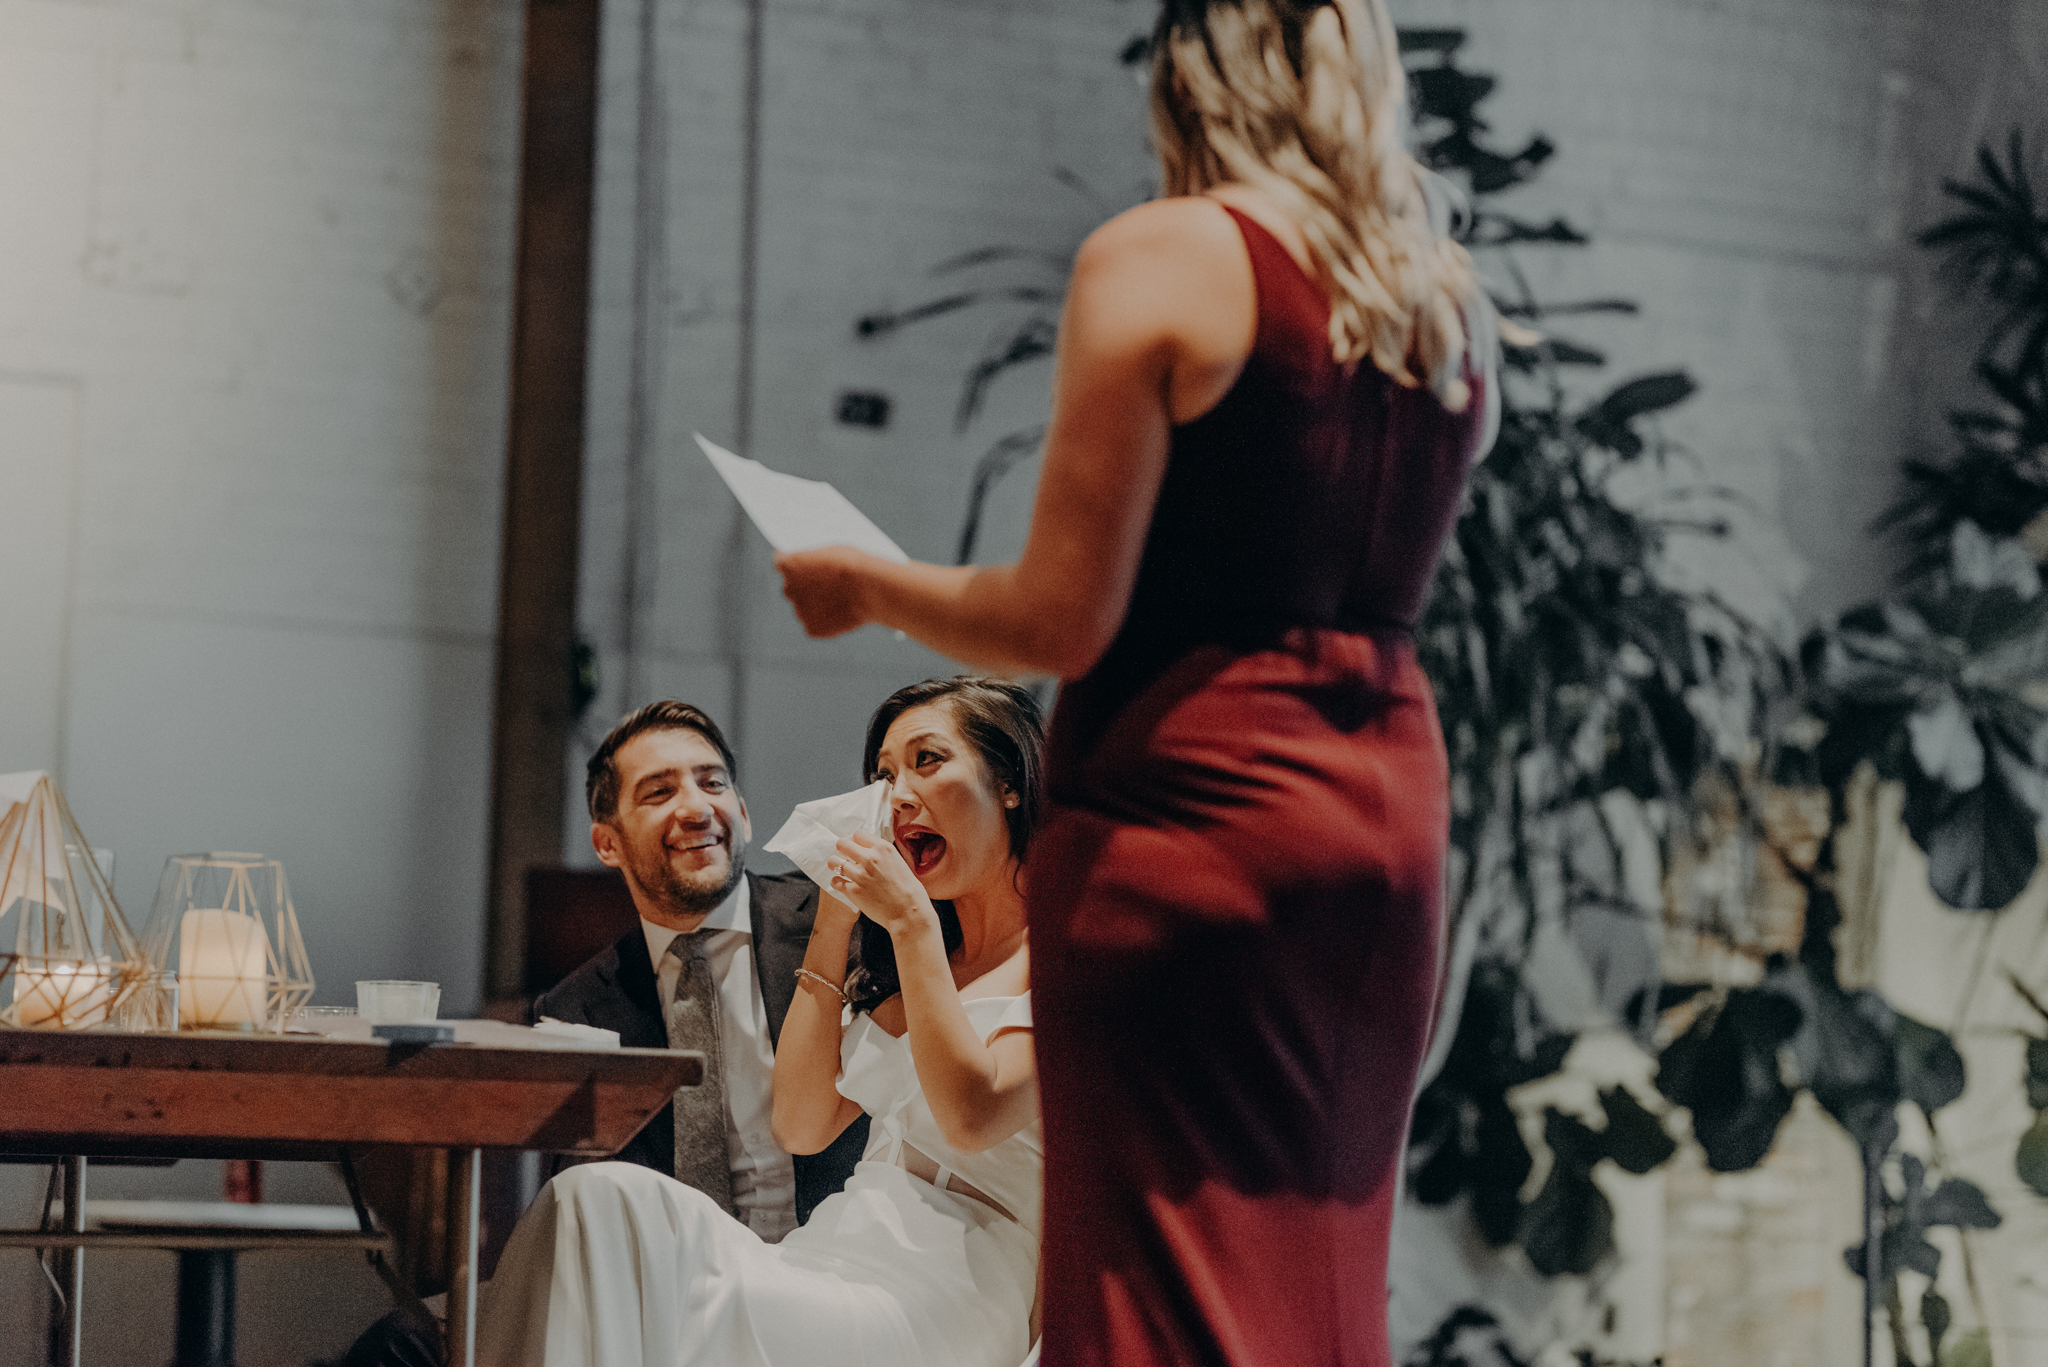 Wedding Photo LA - wedding photographer in los angeles - millwick wedding venue -isaiahandtaylor.com-129.jpg